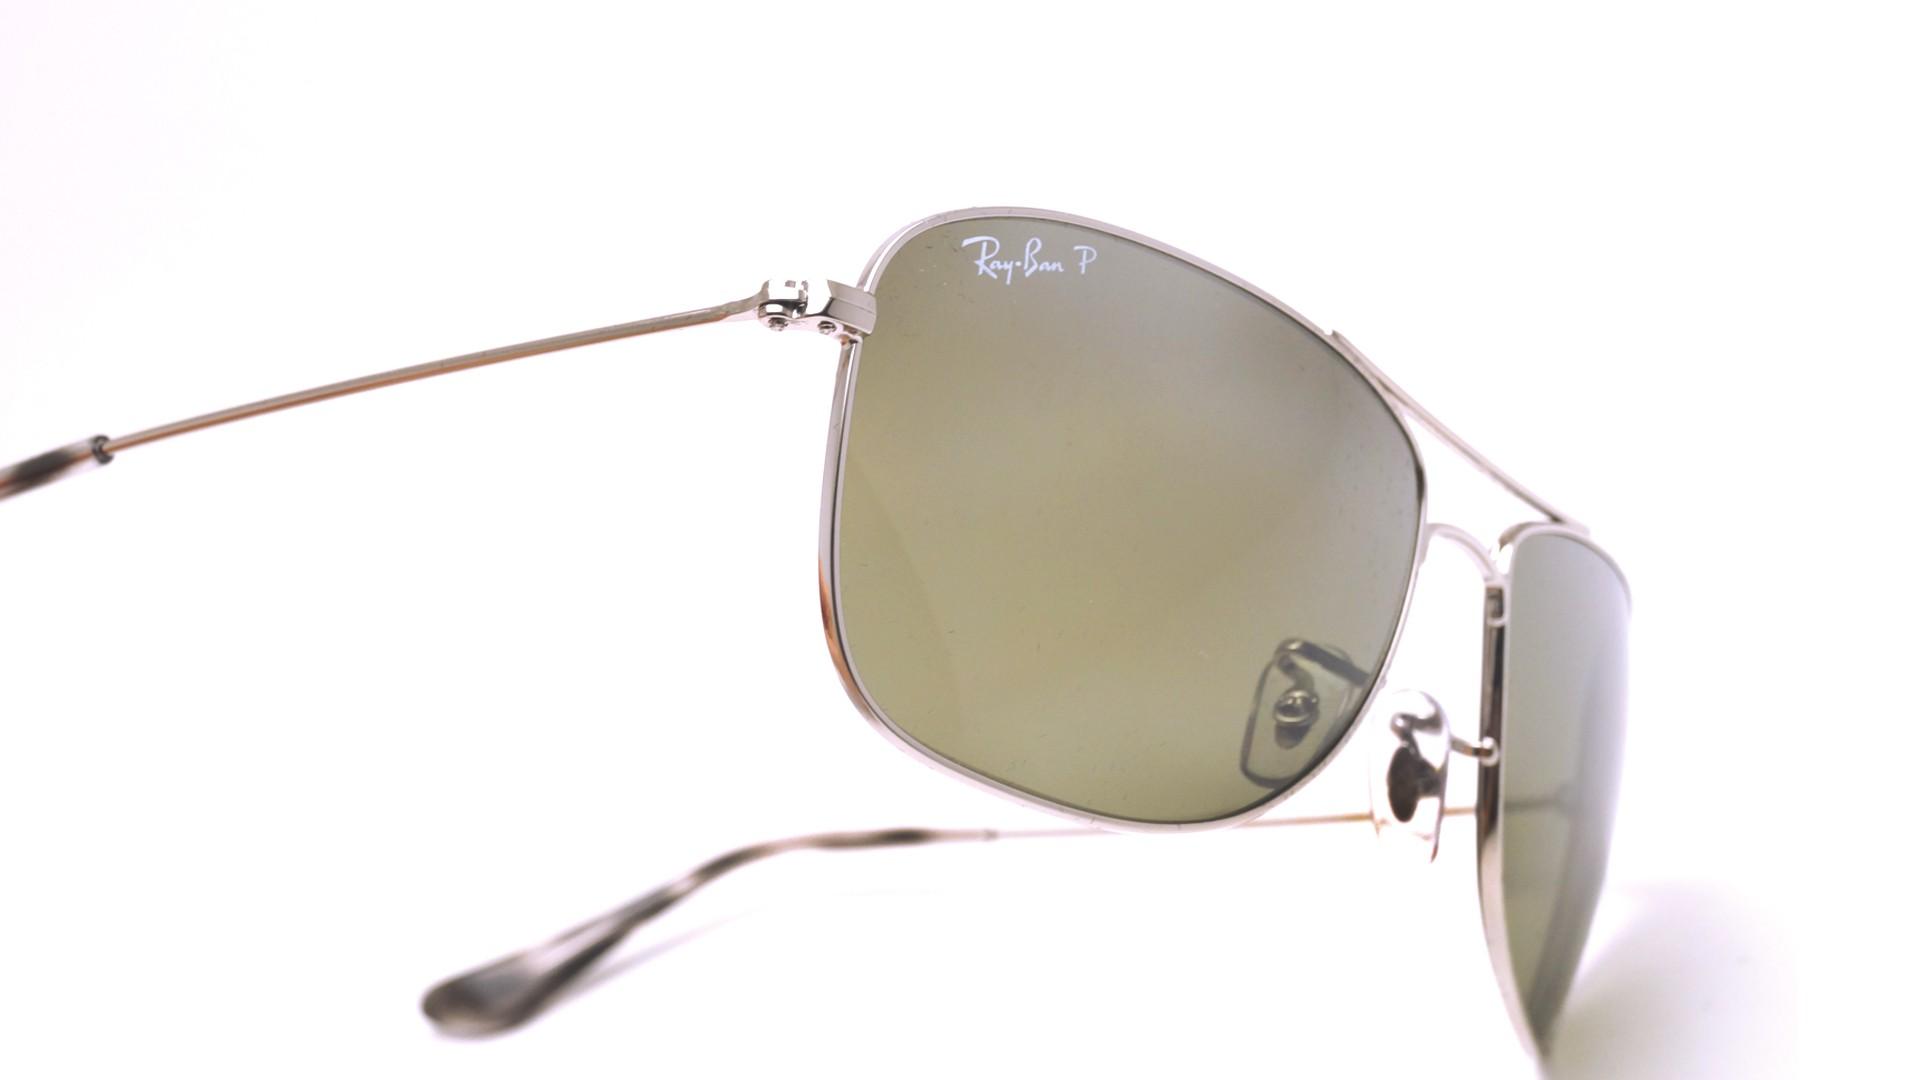 0c1869c3795 Sunglasses Ray-Ban RB3543 003 5J 59-16 Silver Chromance Medium Polarized  Gradient Mirror